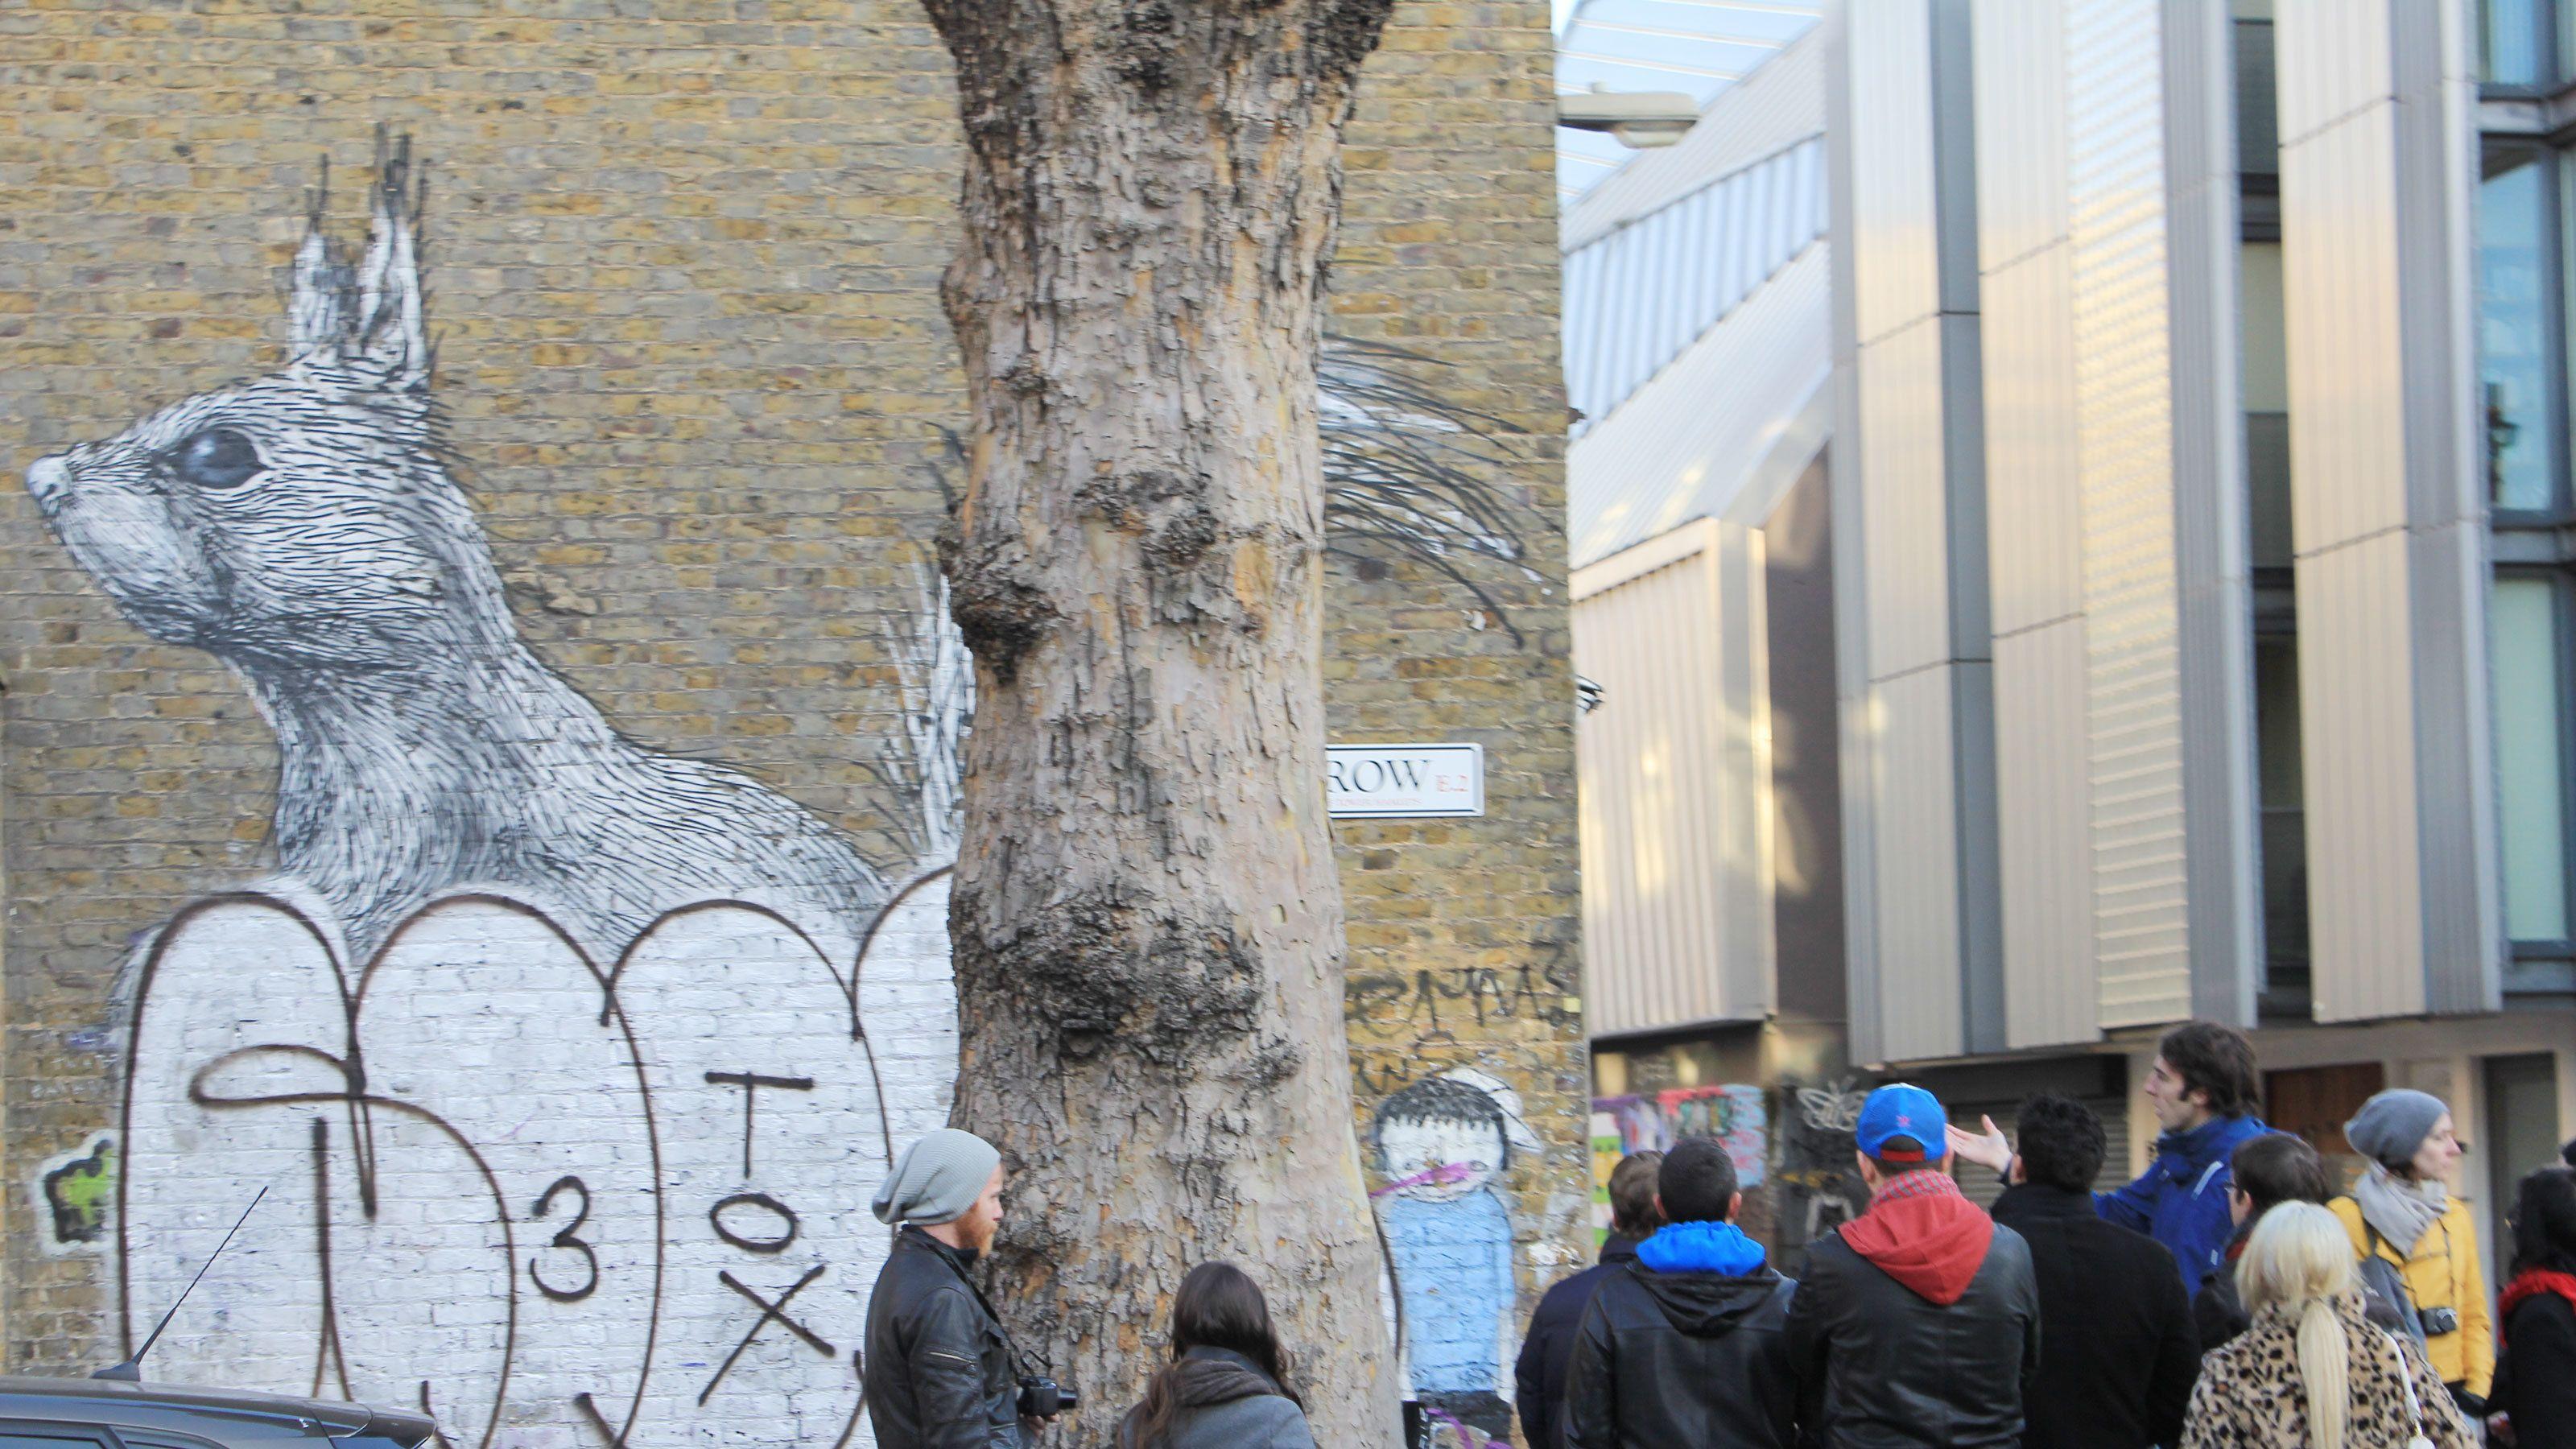 Street Art Tour of London